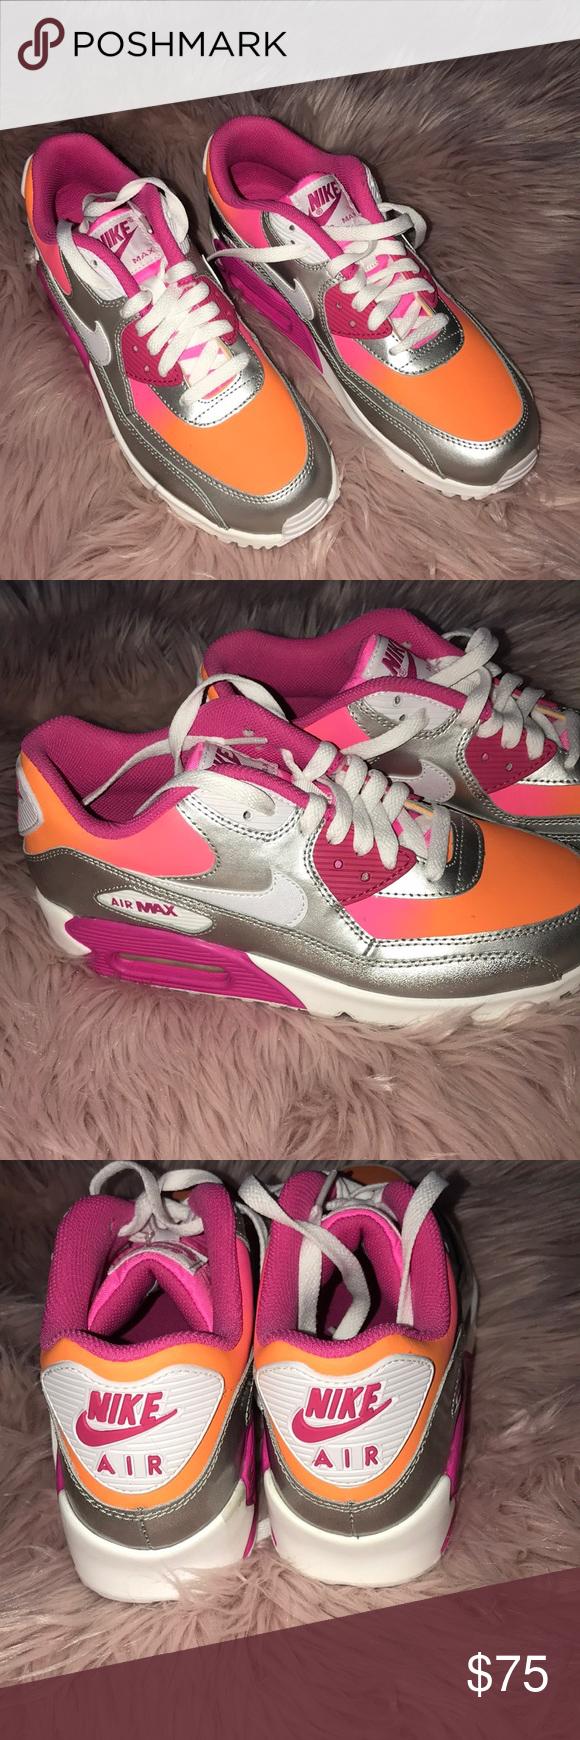 Pensamiento Posesión En marcha  Brand new Nike Air MAX Neon pink/neon orange/silver metallic ...